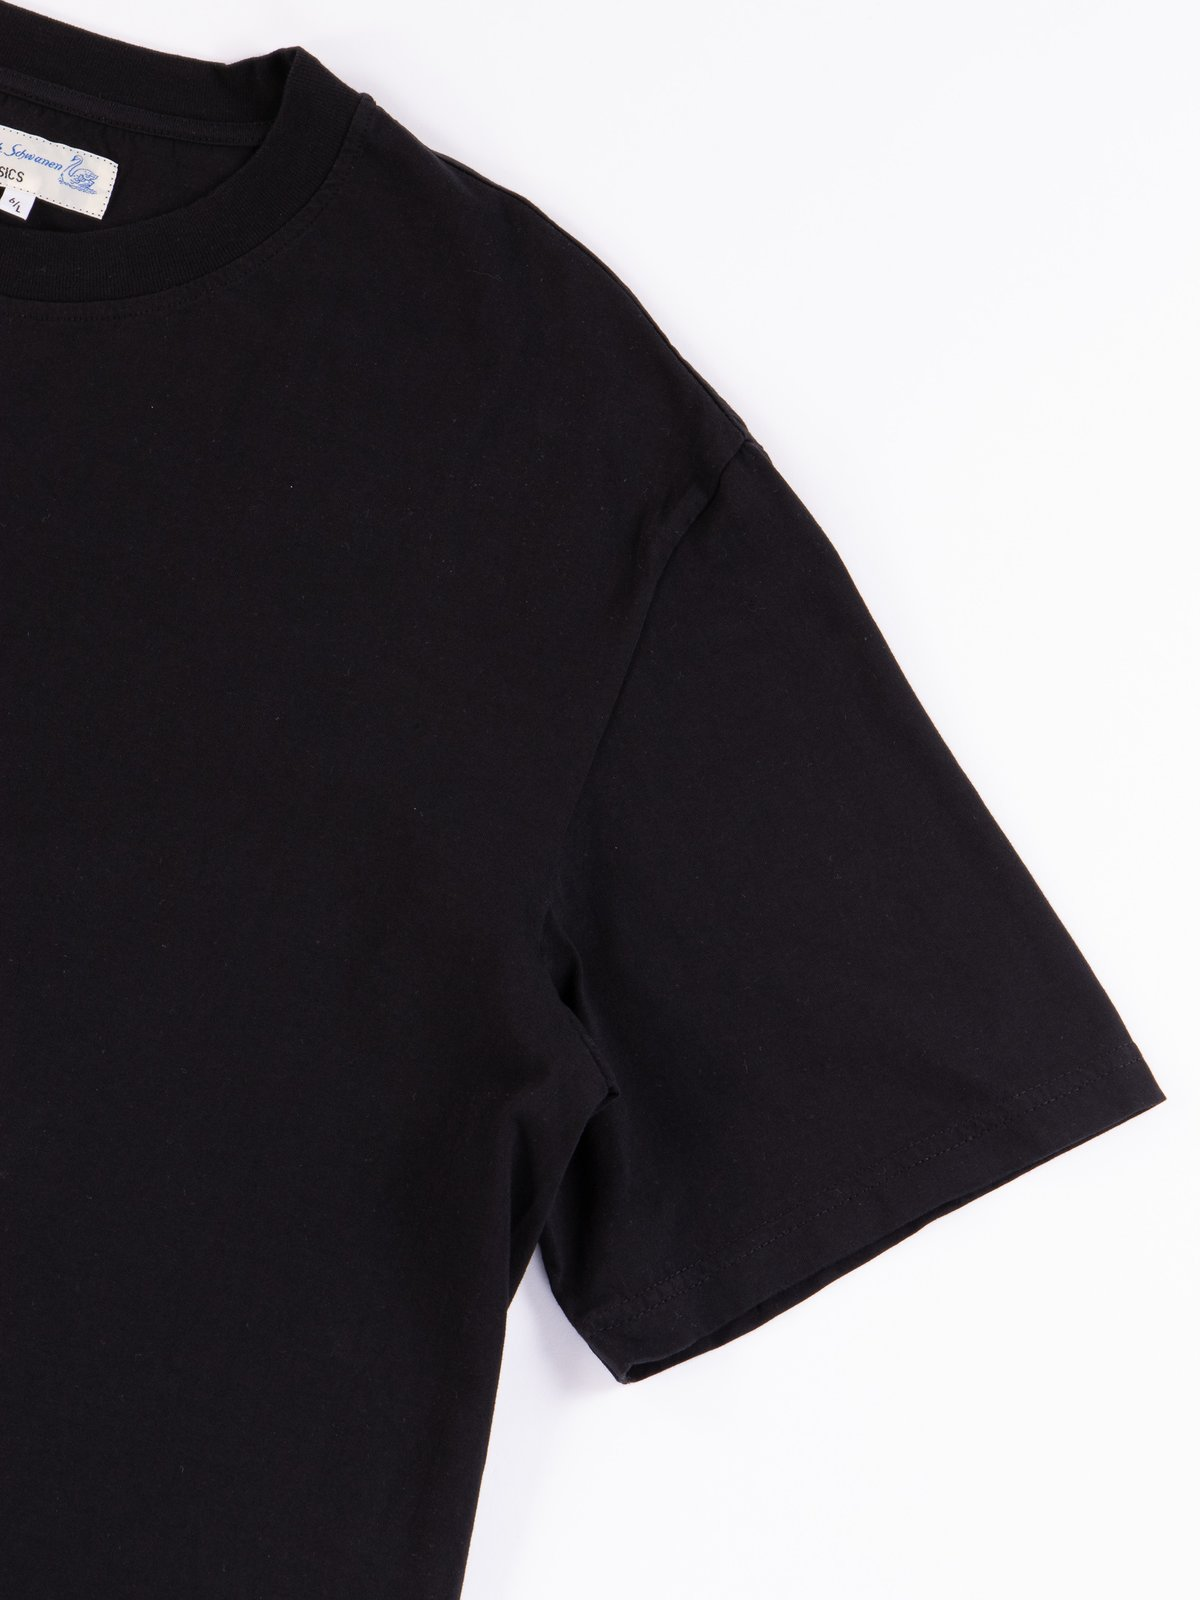 Deep Black Good Basics CTOS01 Oversized Crew Neck Tee - Image 4